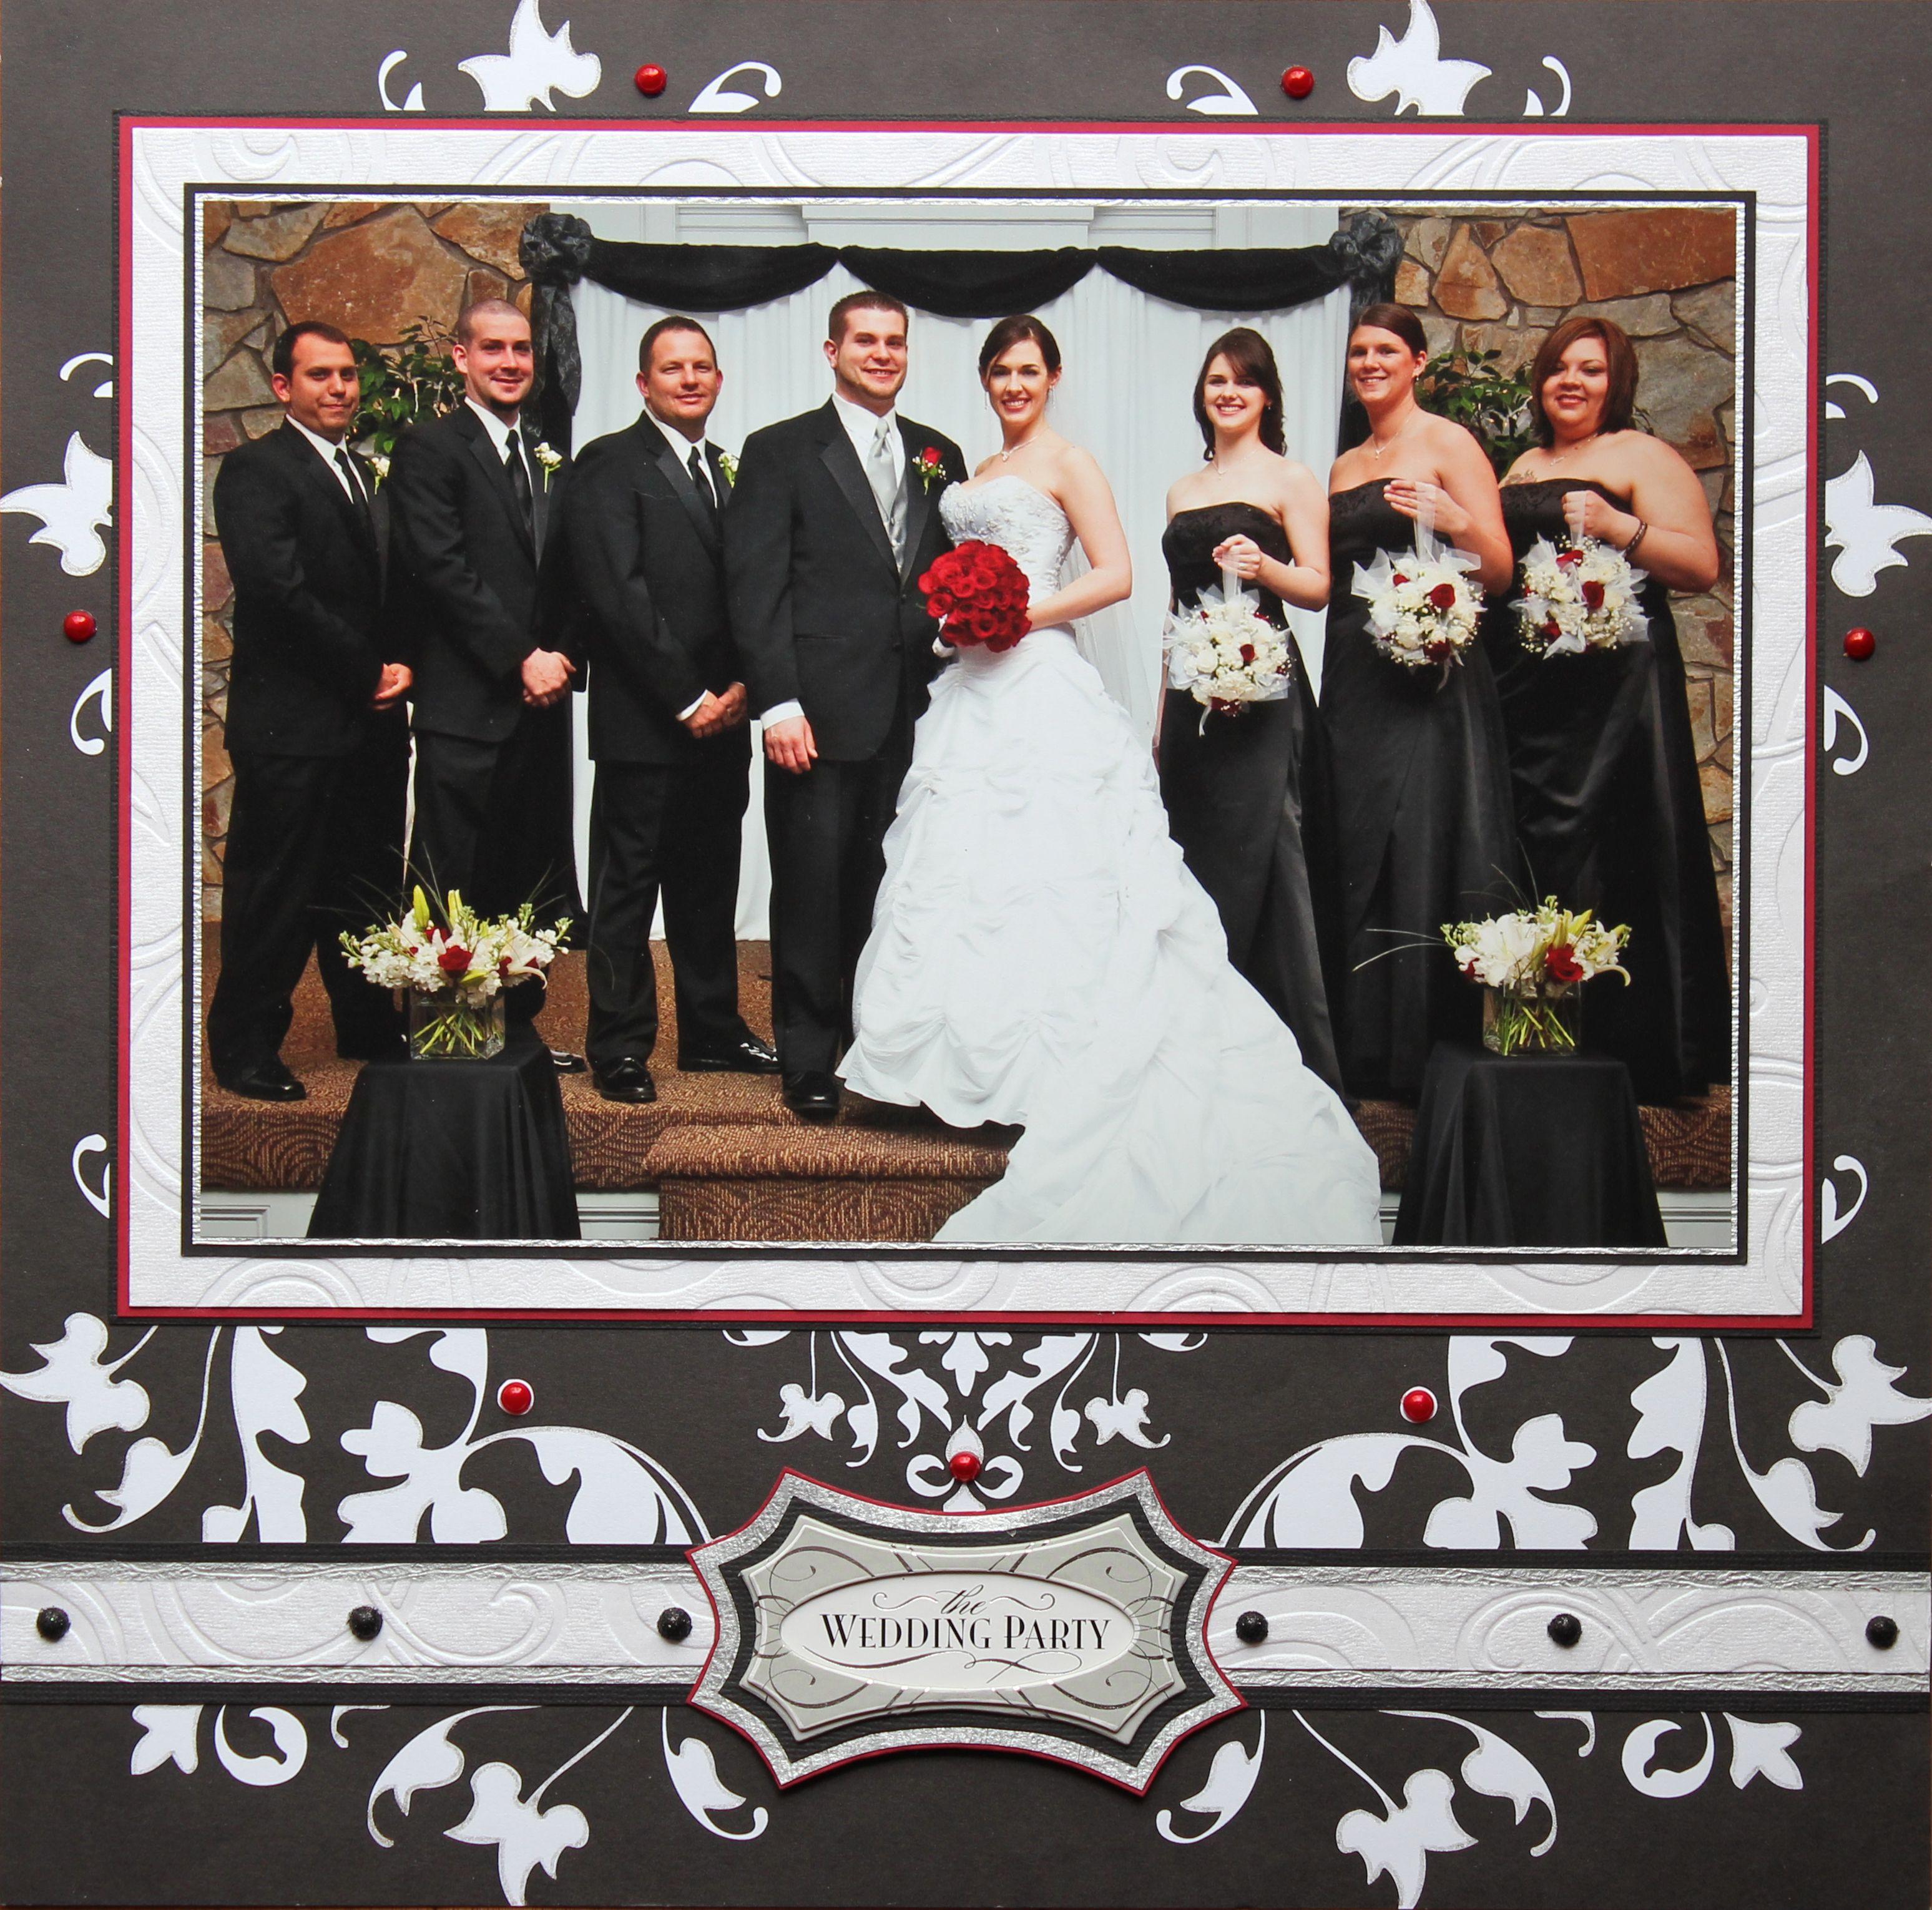 The Wedding Party Wedding scrapbooking